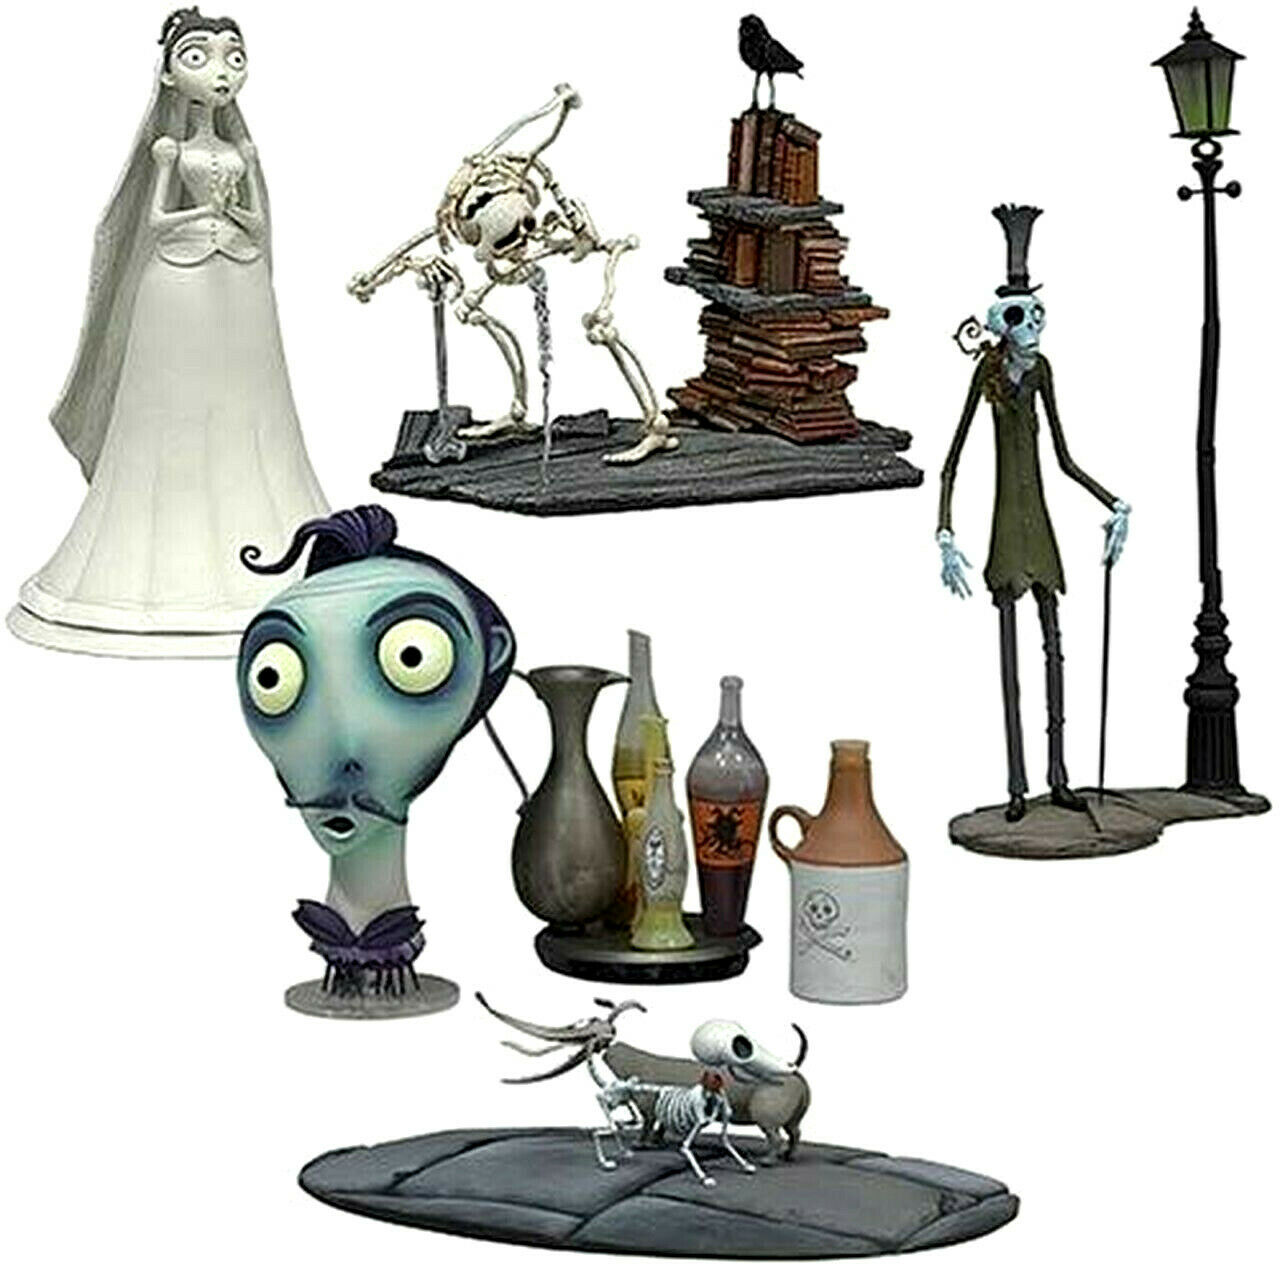 Corpse Bride Minifiguren Serie 2 bis 11cm Mcfarlane